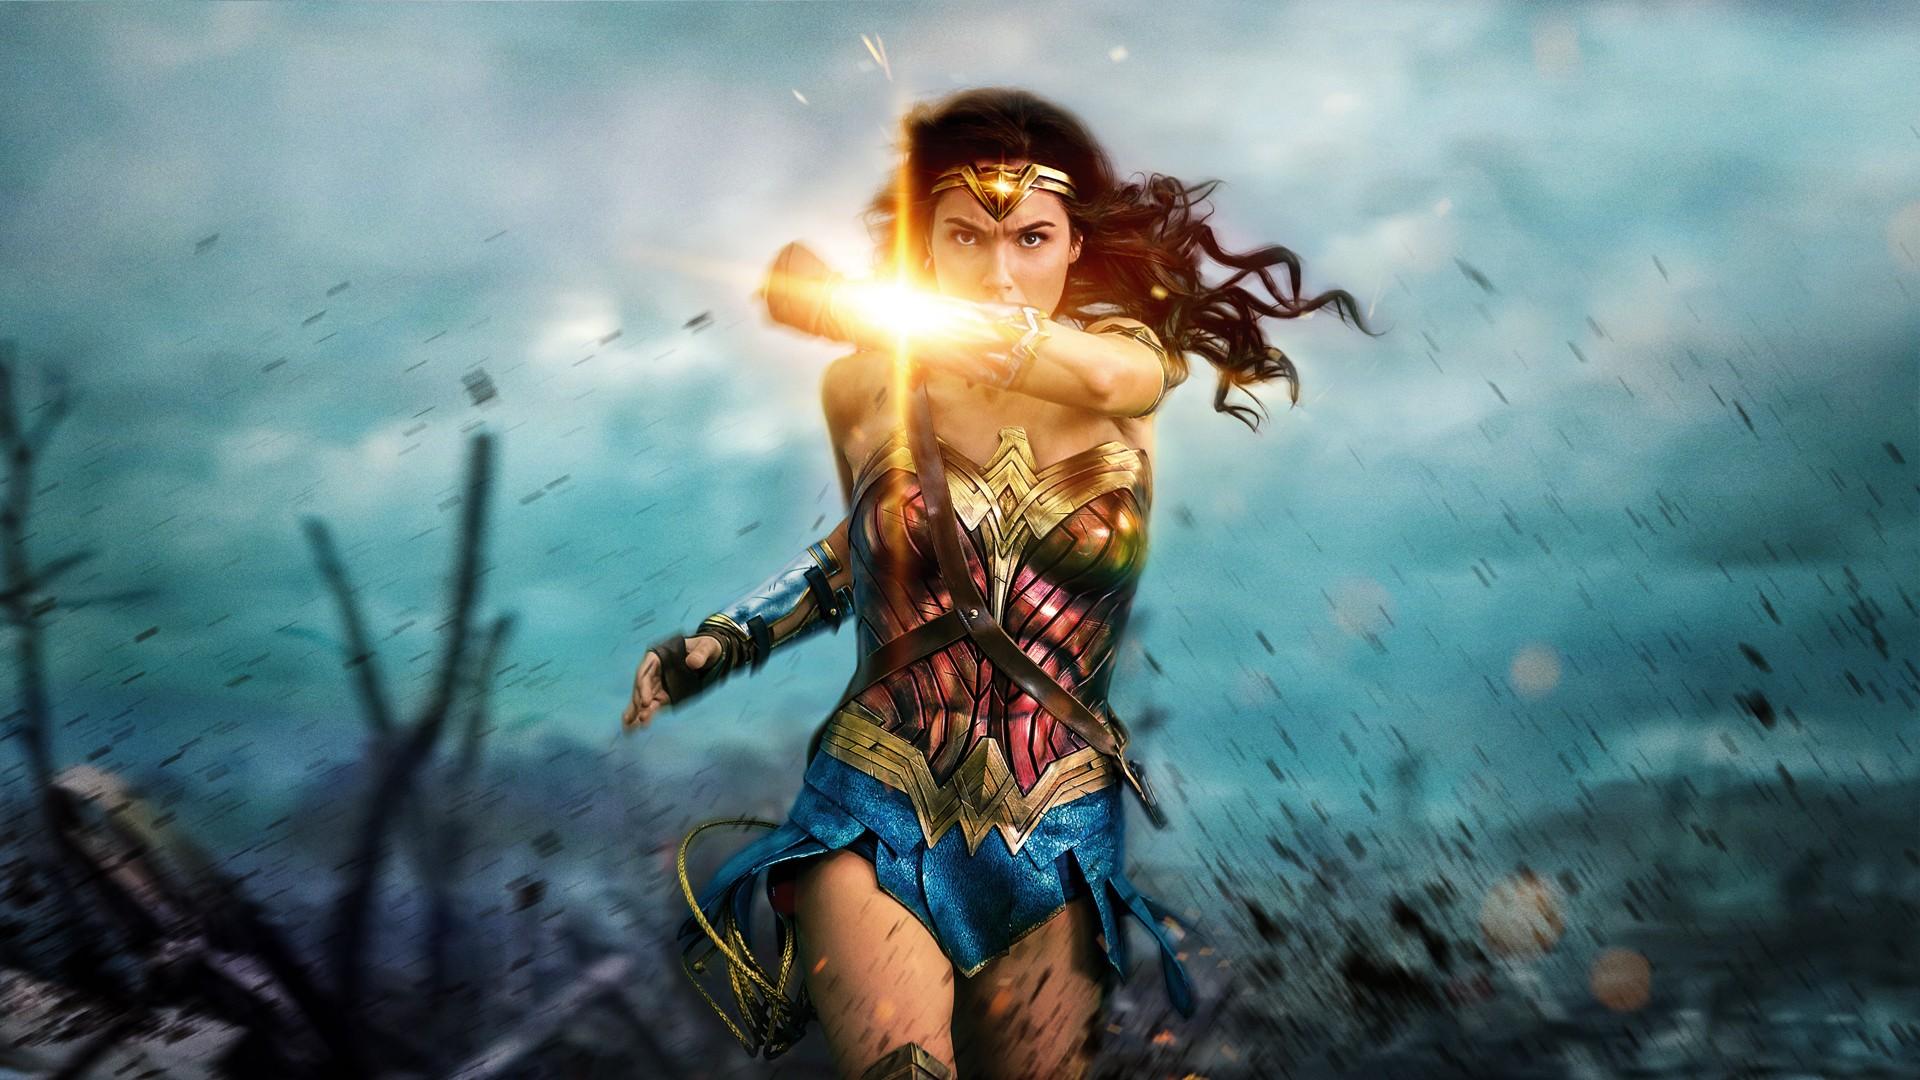 Wonder woman wallpaper download free amazing wallpapers - Wonder woman wallpaper ...